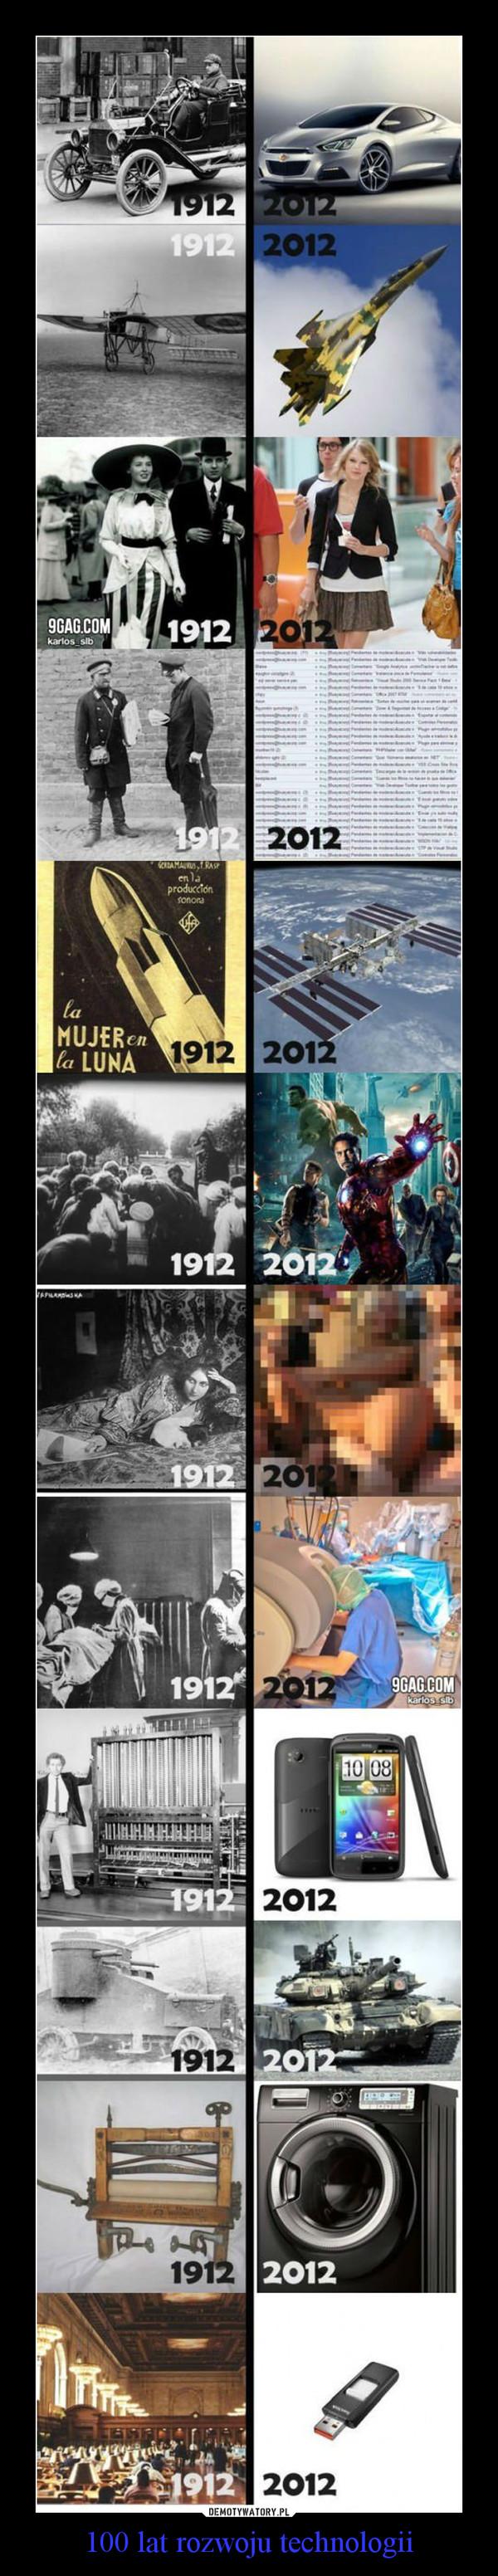 100 lat rozwoju technologii –